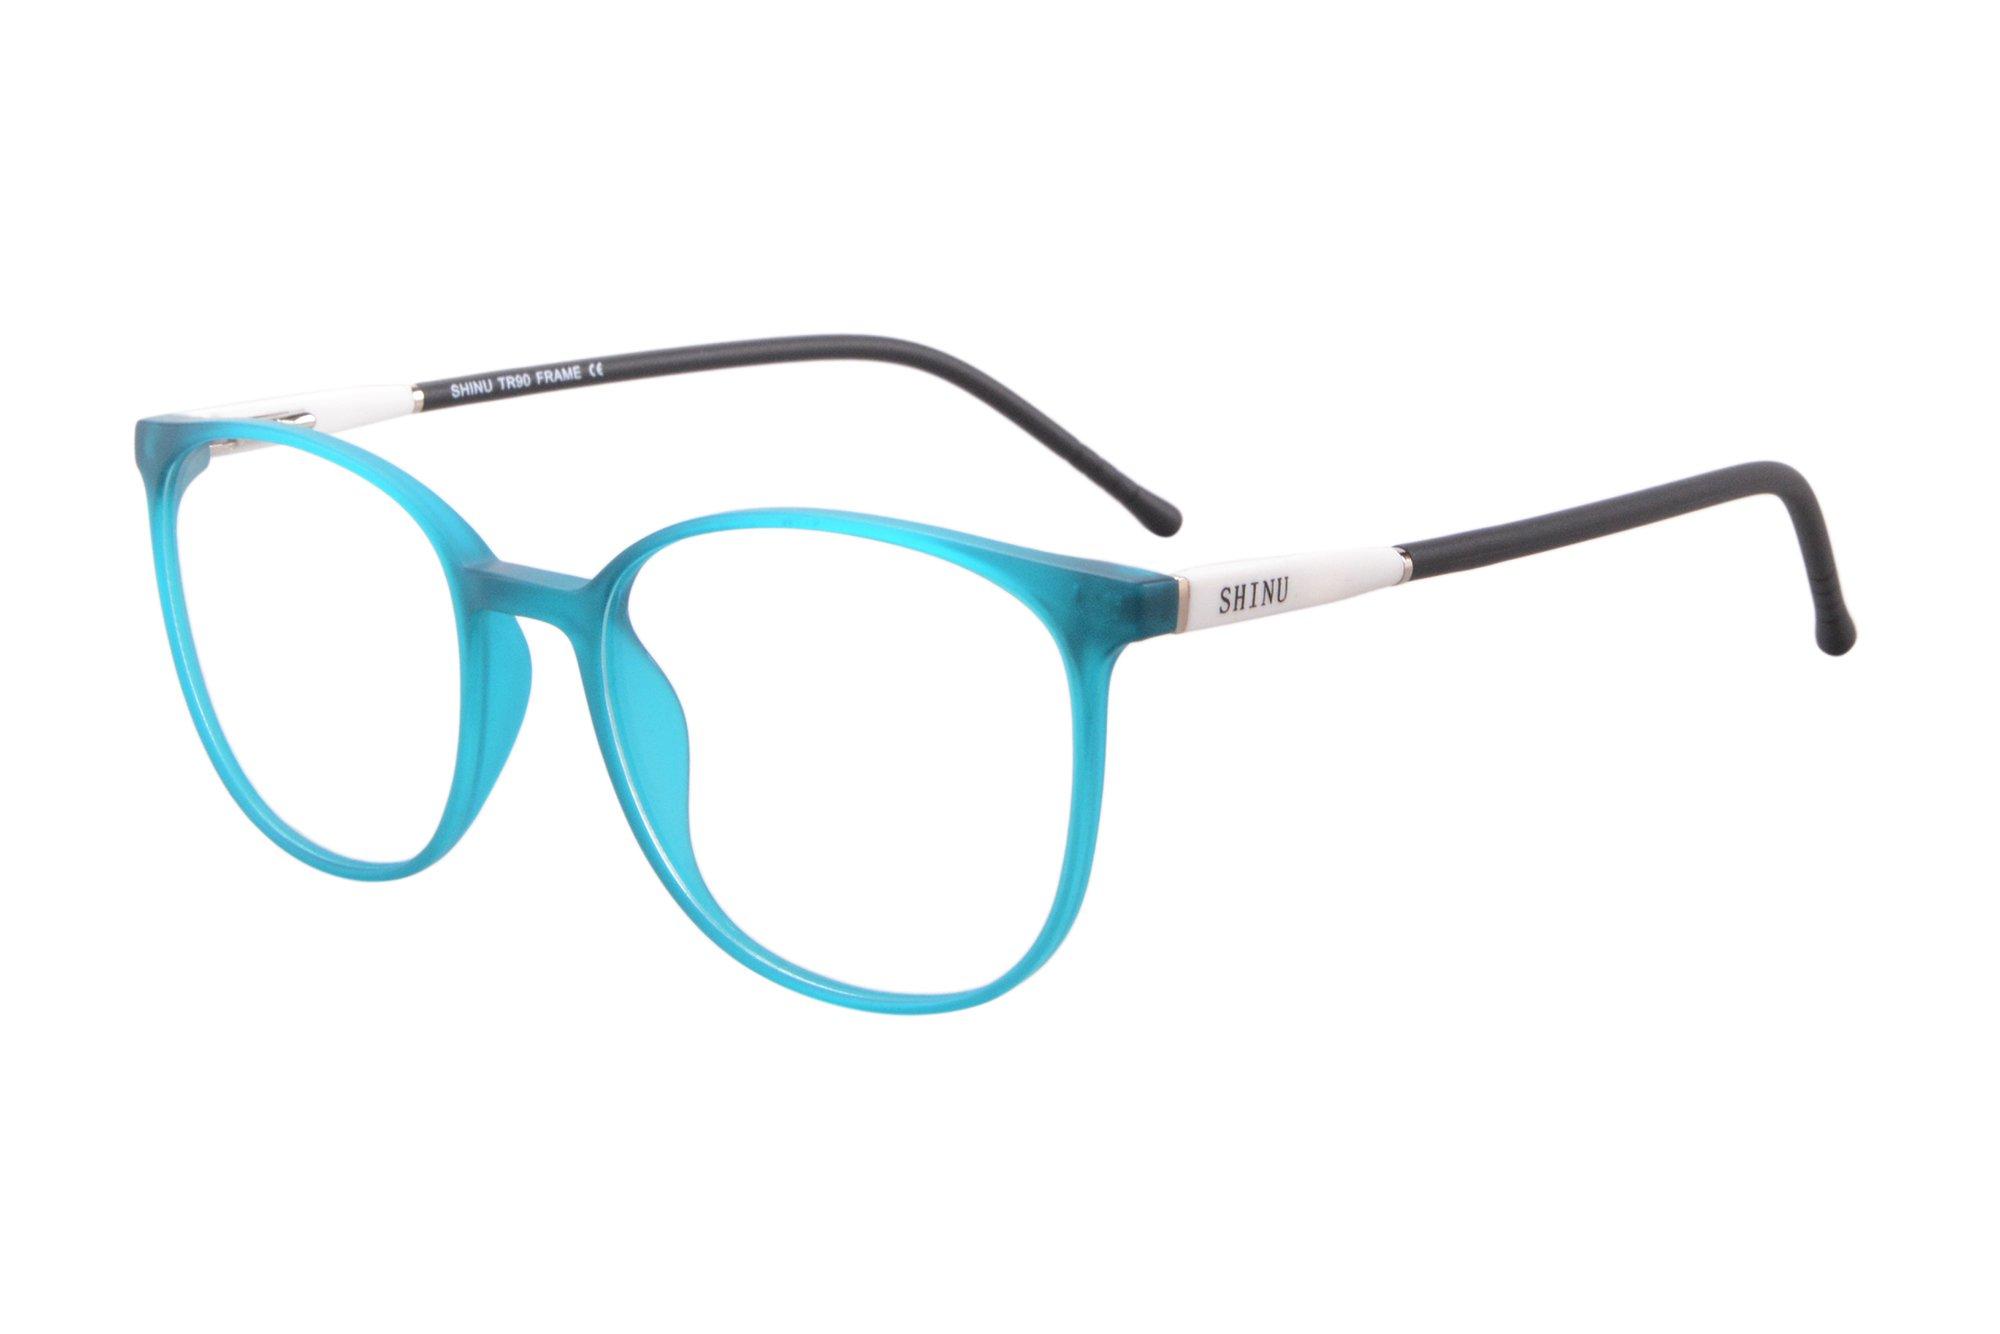 SHINU TR90 Lightweight Frame Progressive Multifocus Reading Glasses-SH079(blue, up 1.00 down 3.00)